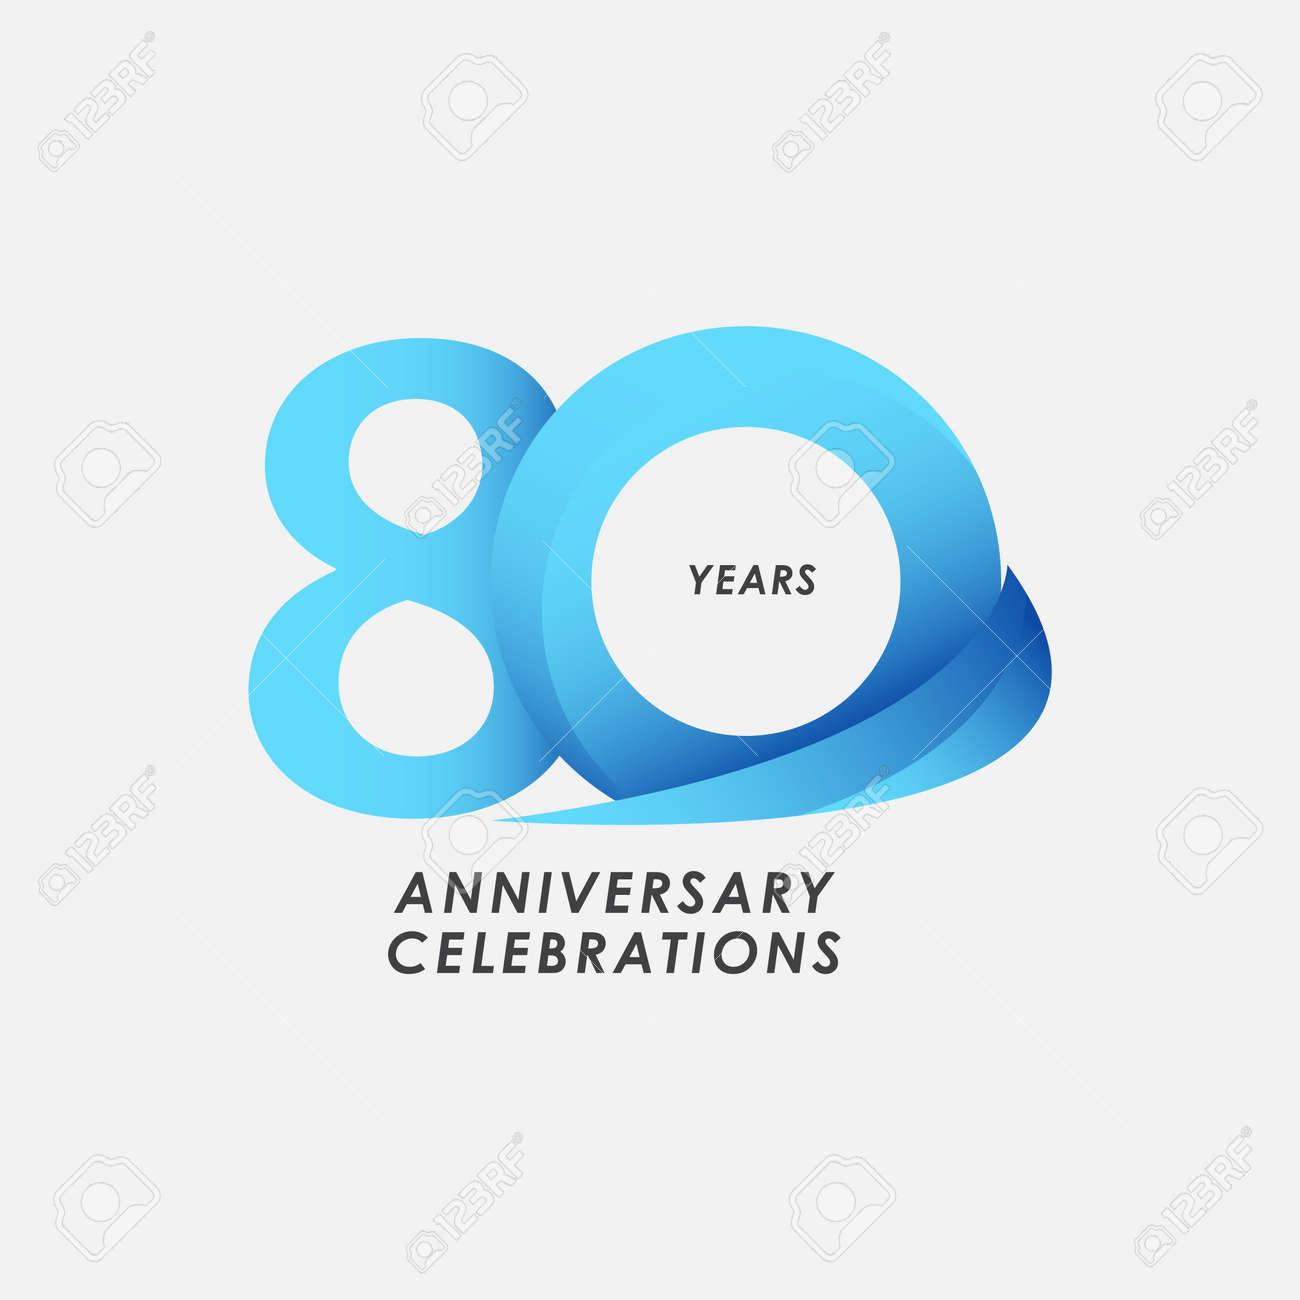 80 Years Anniversary Celebrations Vector Template Design Illustration - 163697979